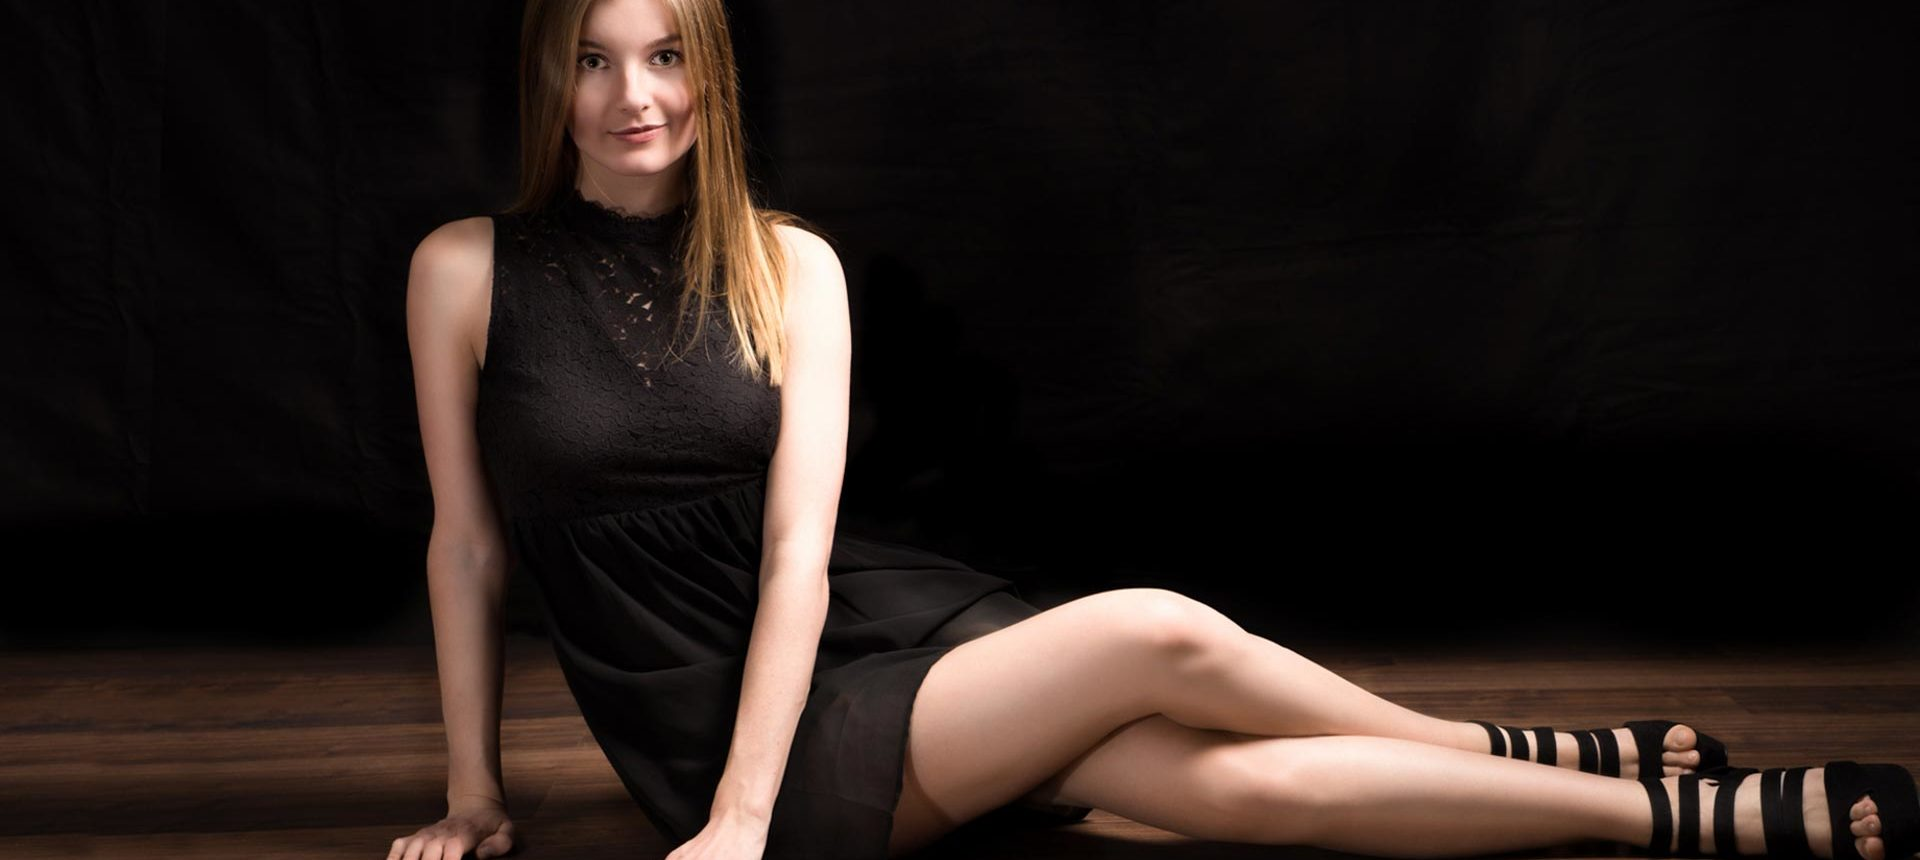 Modelagentur BLACKTENT Fotografie